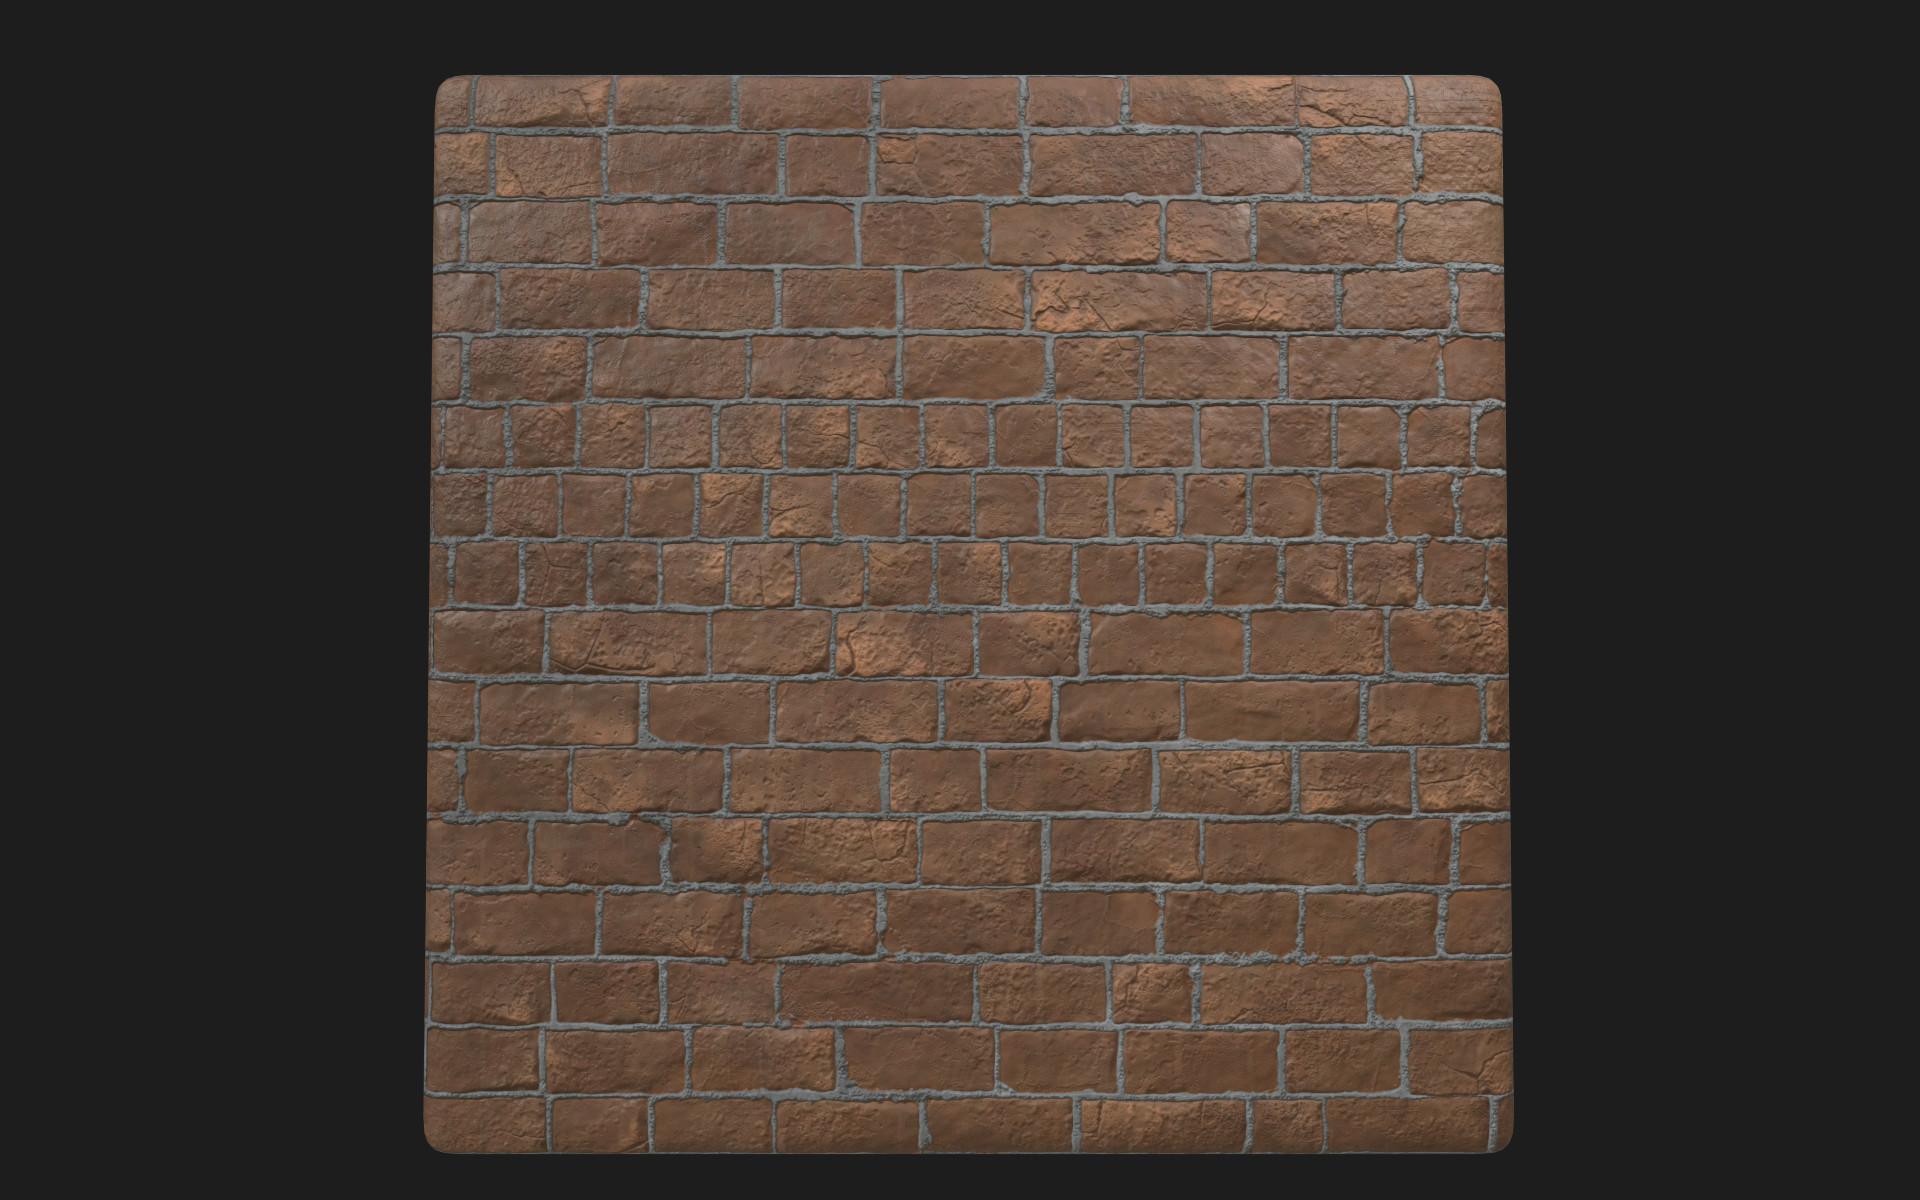 Fausto sciallis brick 2b